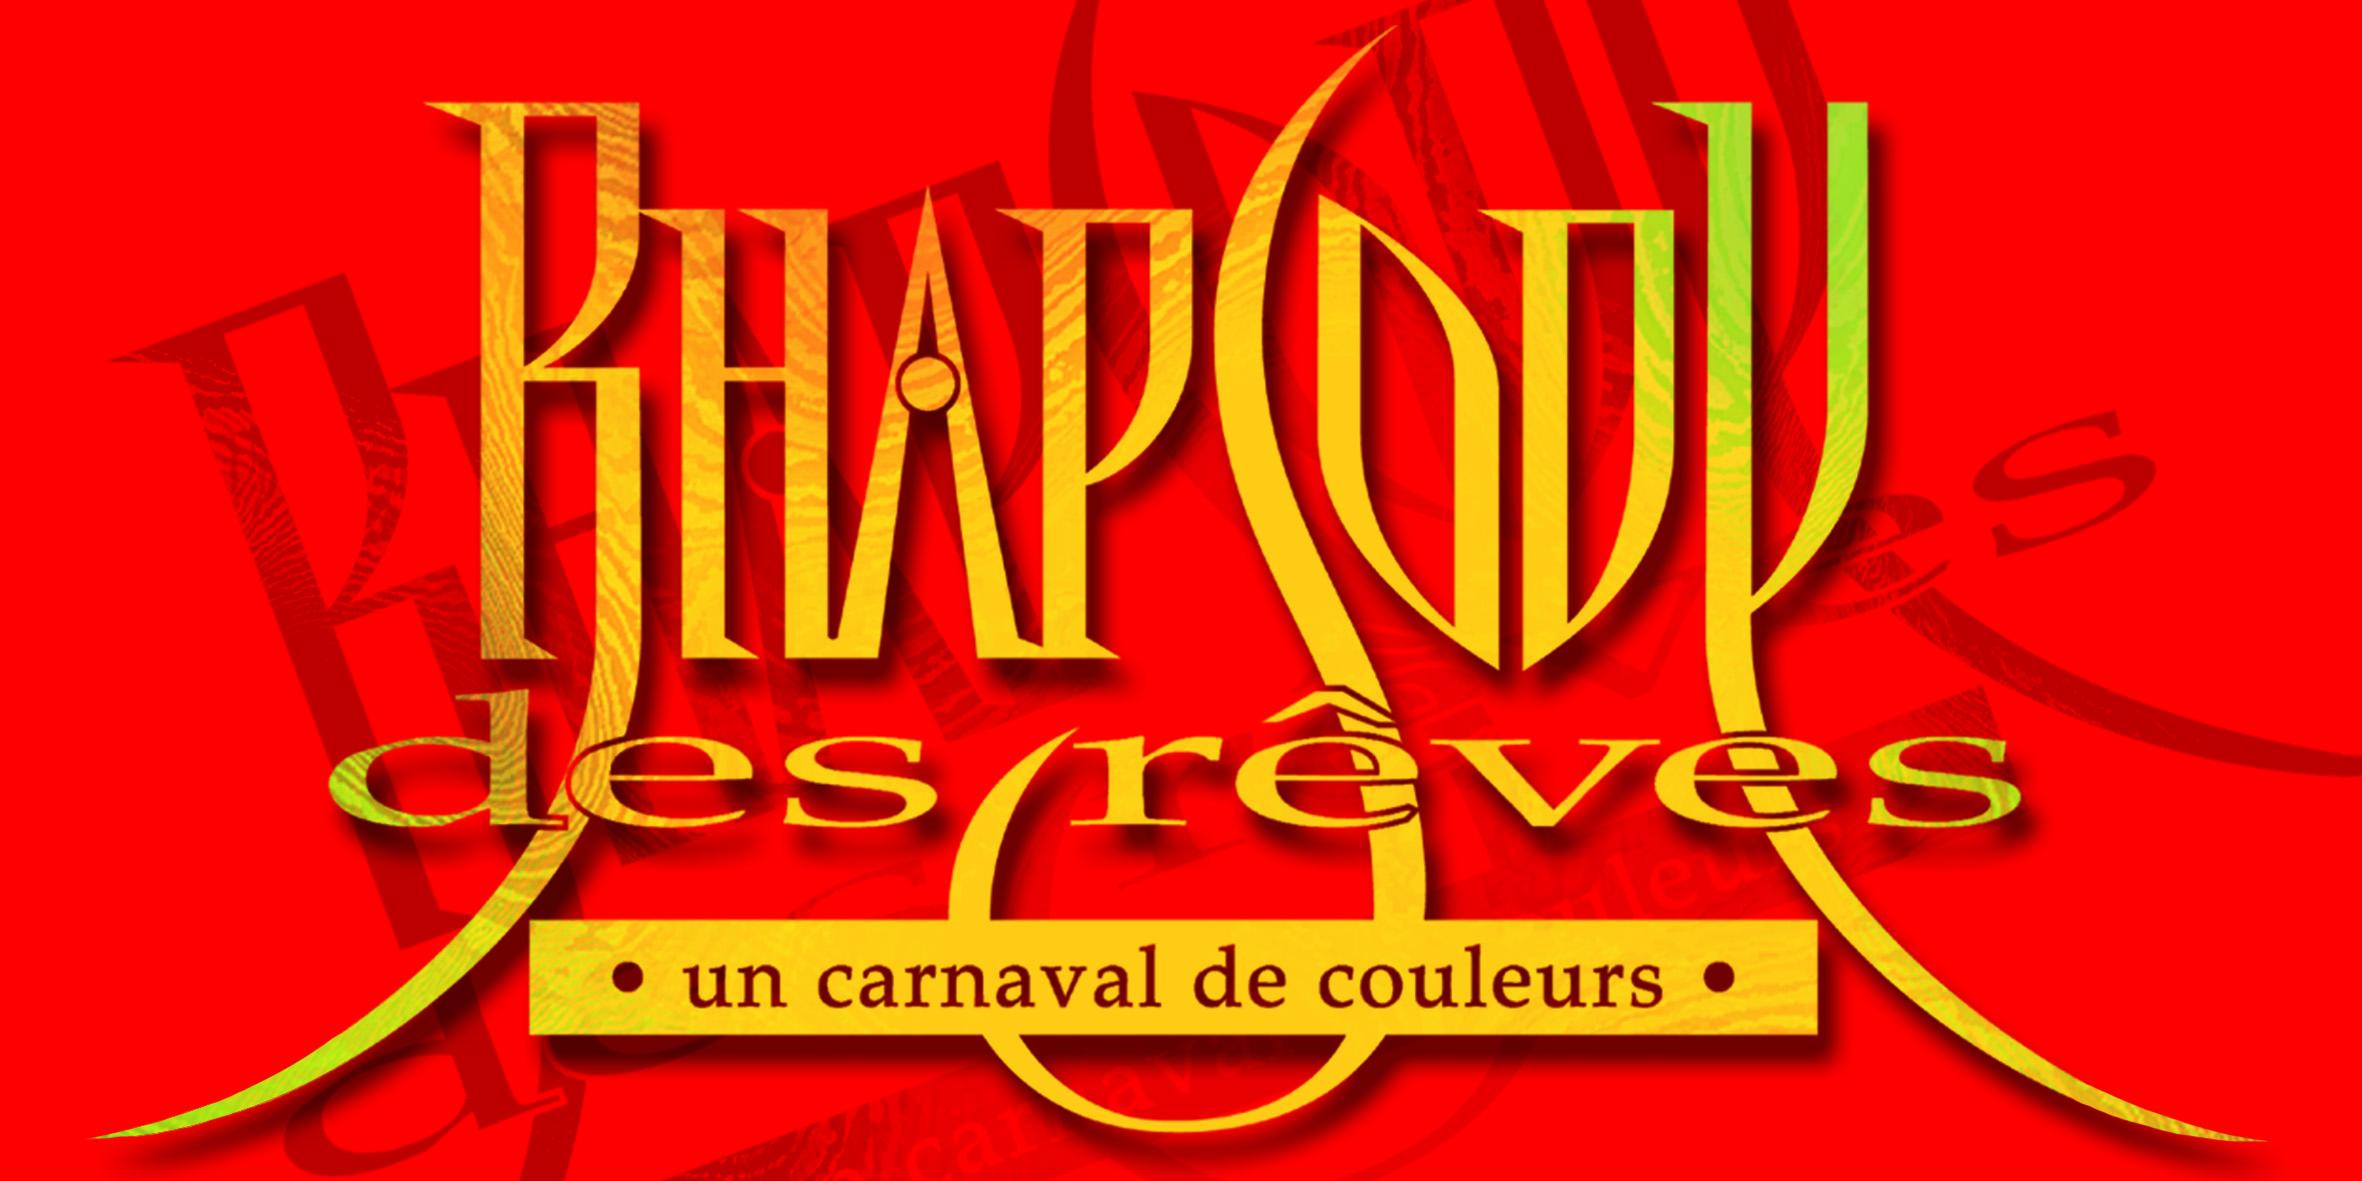 rhapsody-des-reves